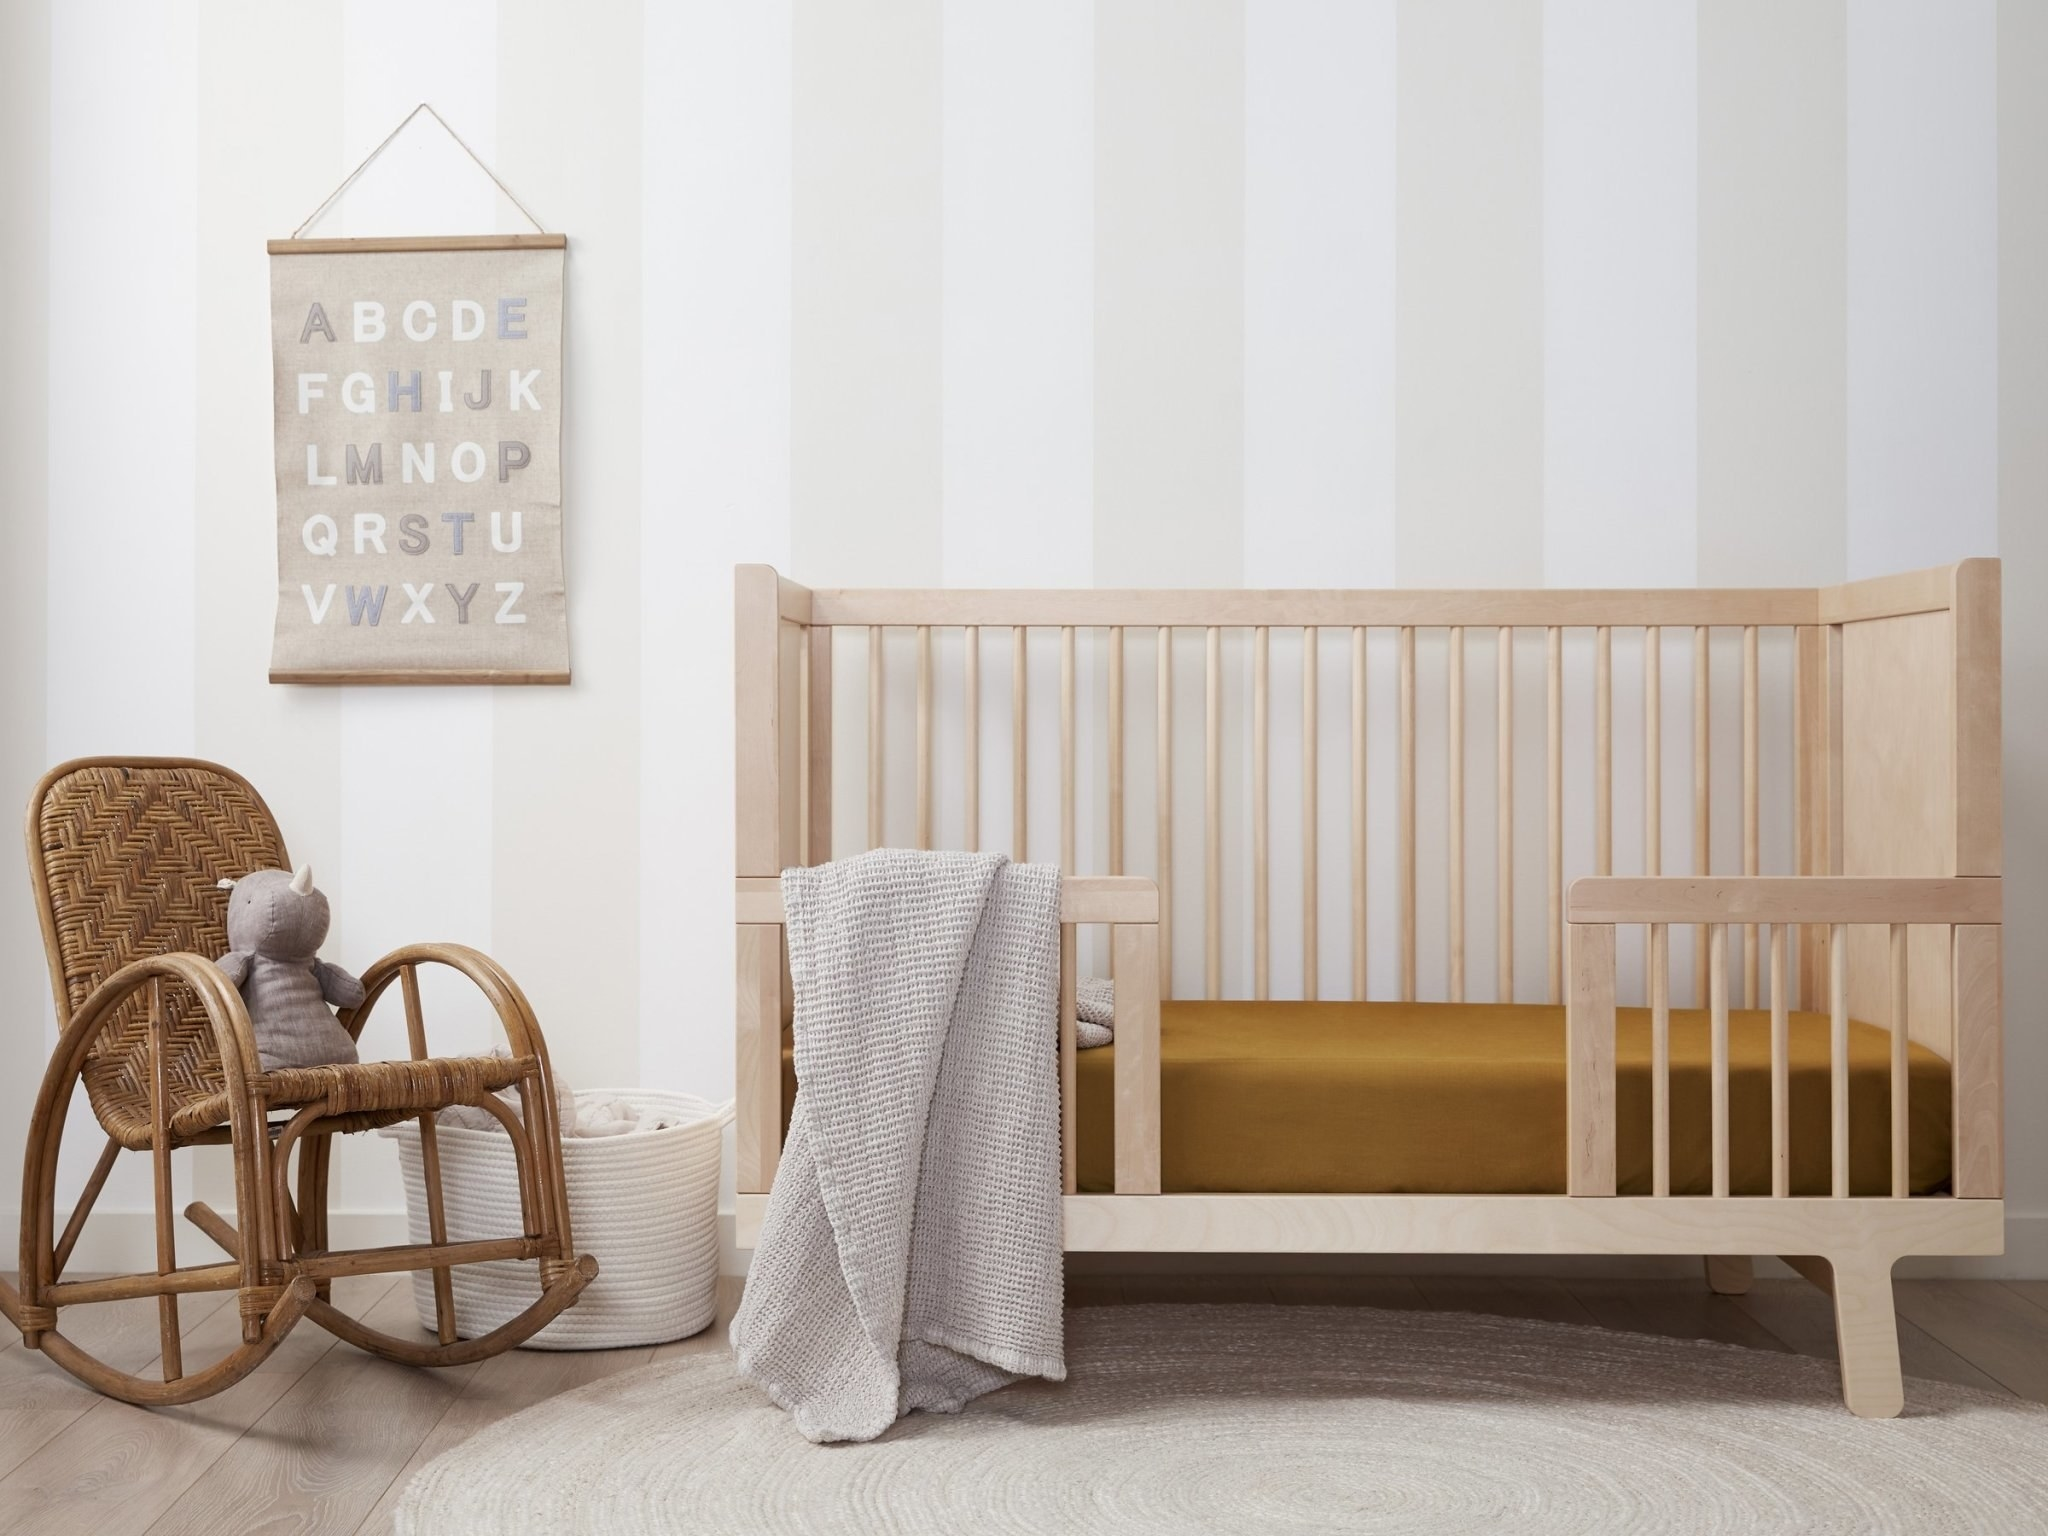 ochre colored sheets in a crib